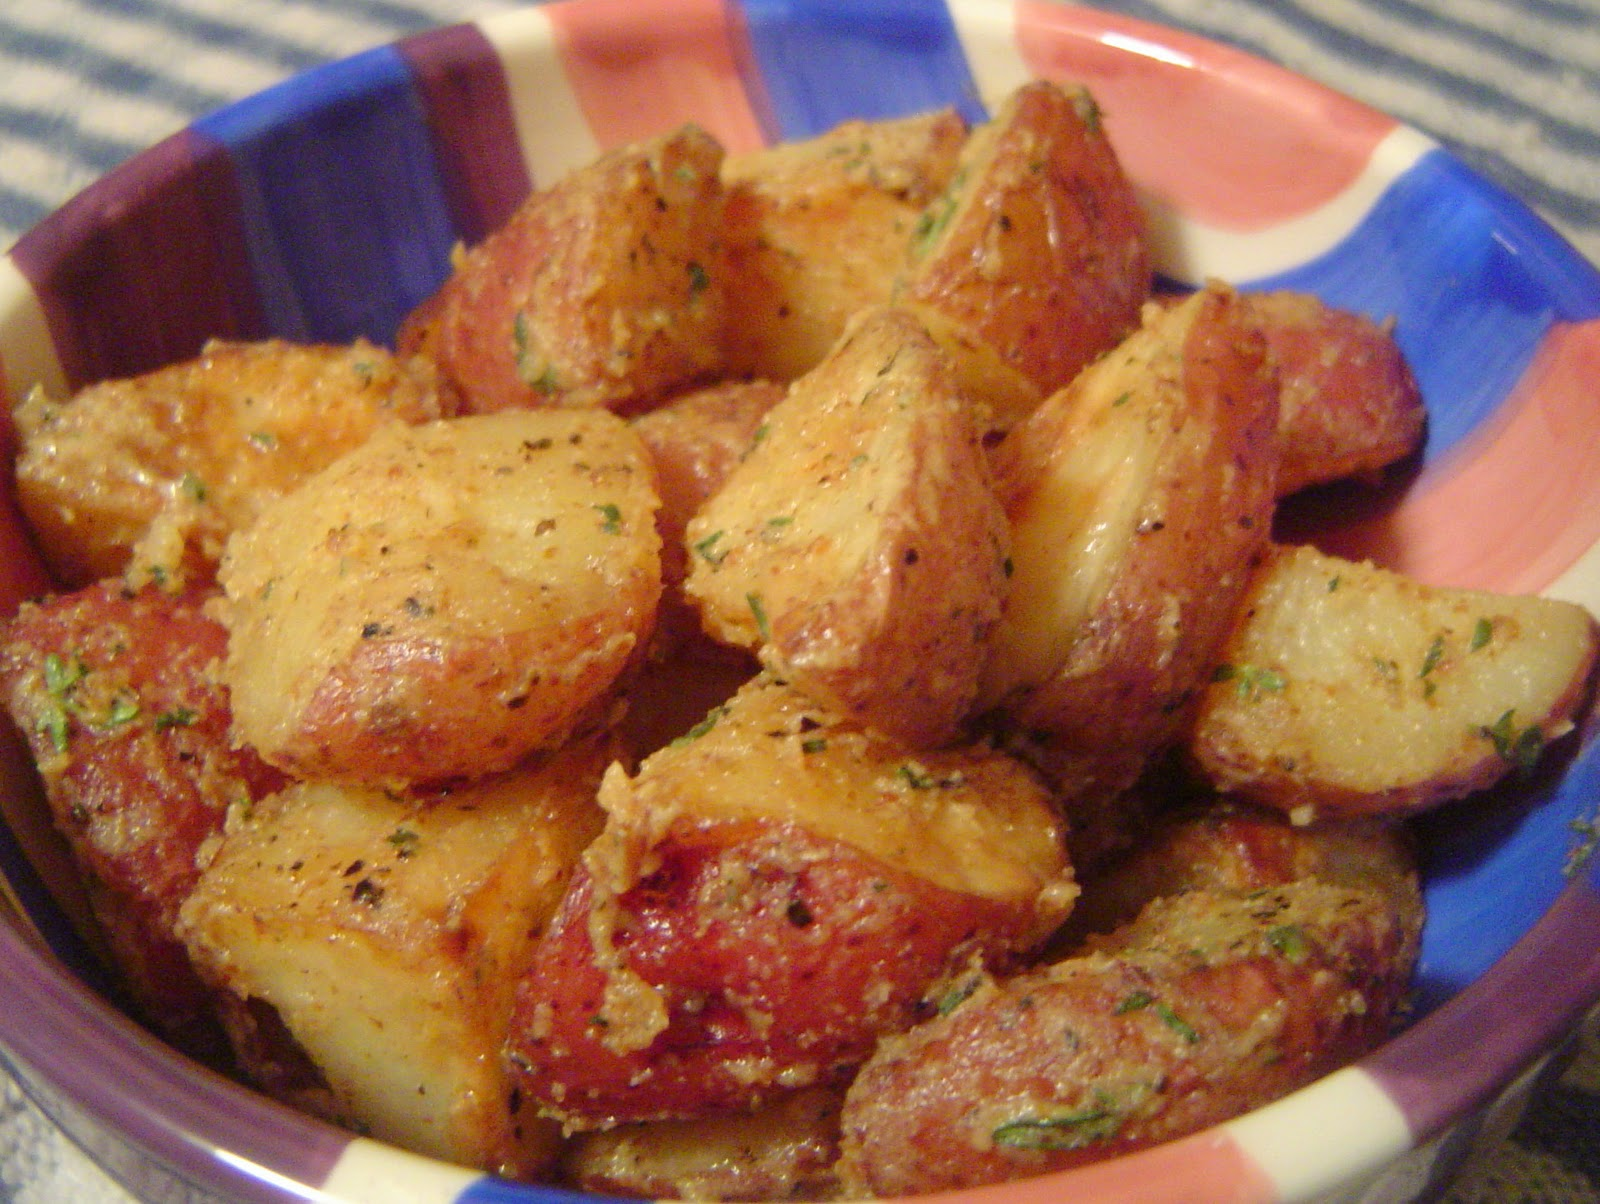 Stuffed Red Bliss Potatoes Recipes — Dishmaps